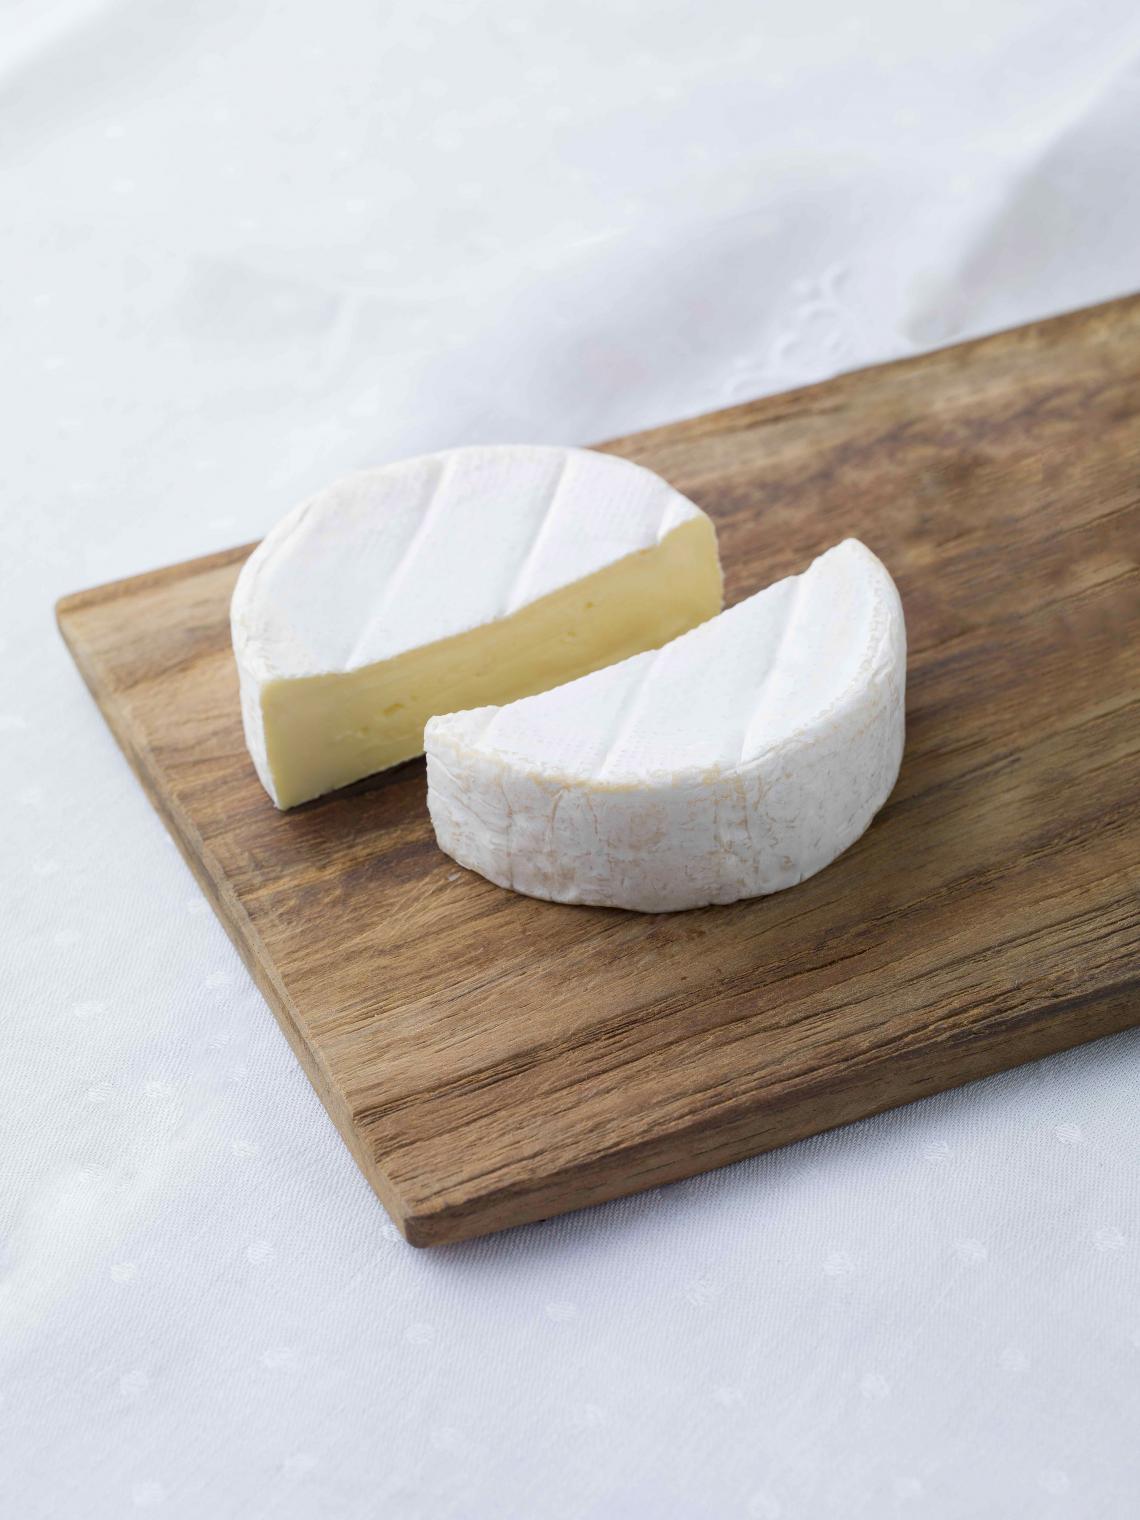 ILE DE FRANCE® Petit Brie on a plate